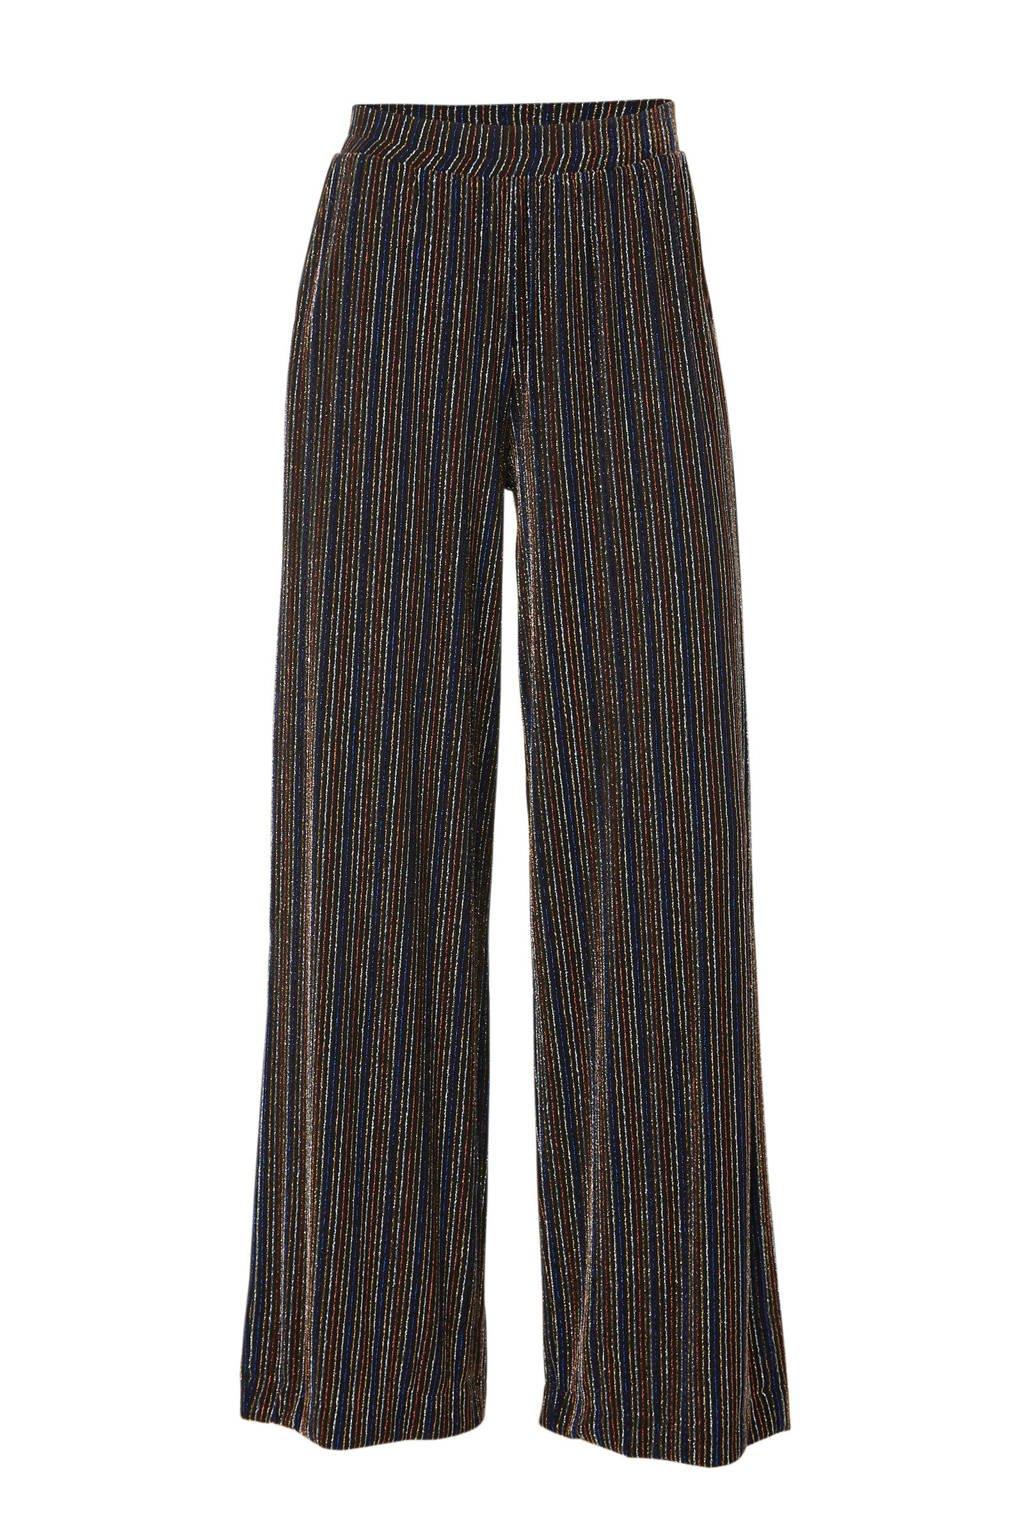 EDITED high waist loose fit broek Daithi met all over print zwart/blauw/rood, Zwart/blauw/rood